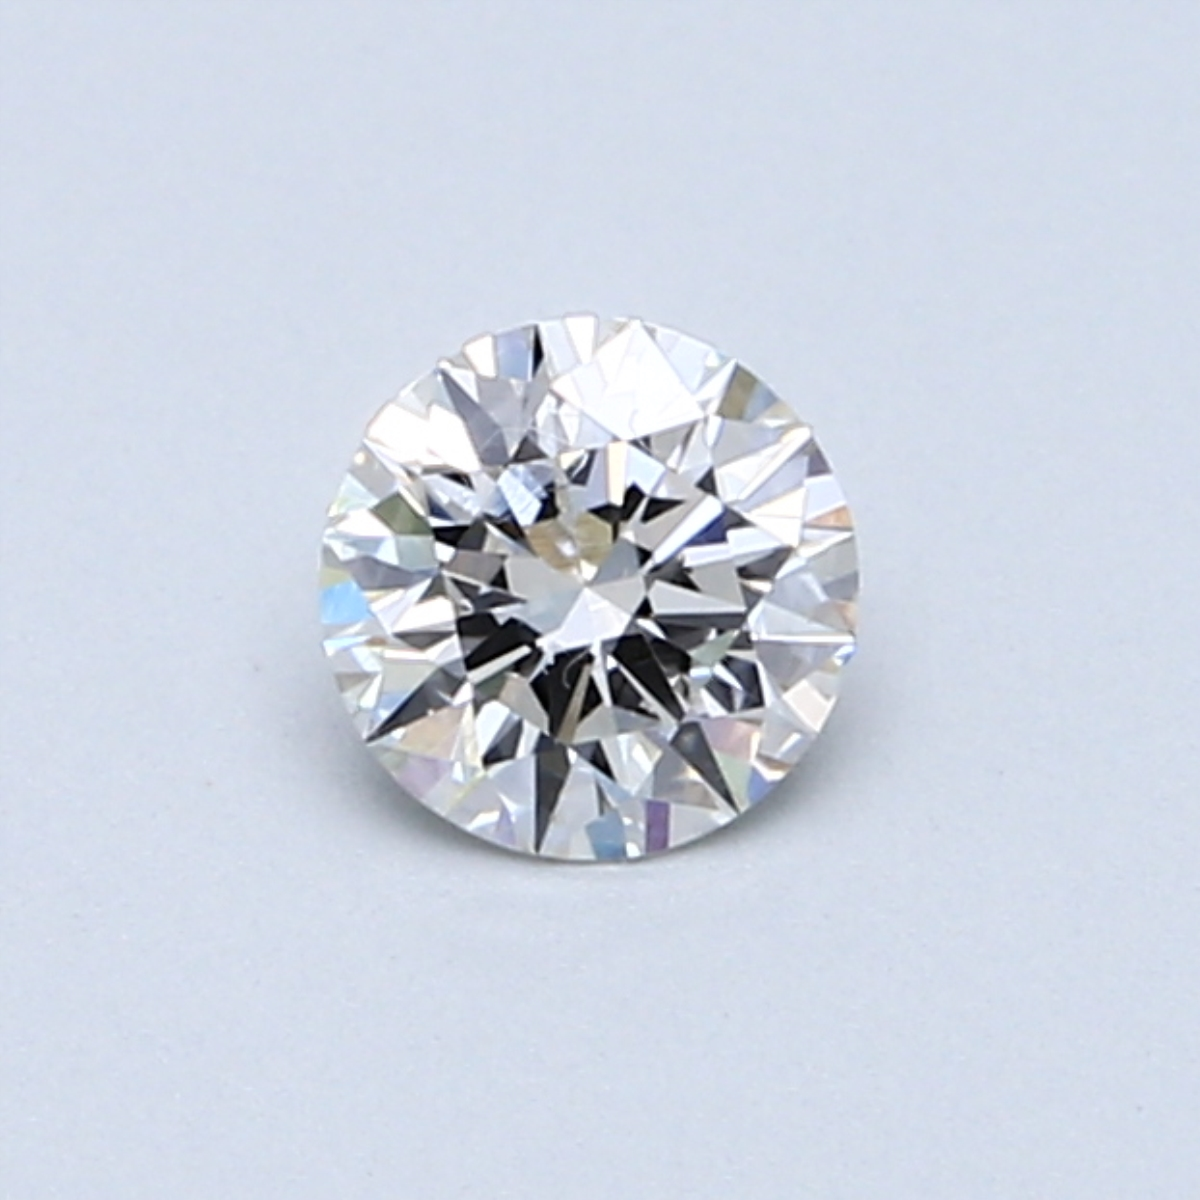 0.40 Carat I VS2 Round Diamond